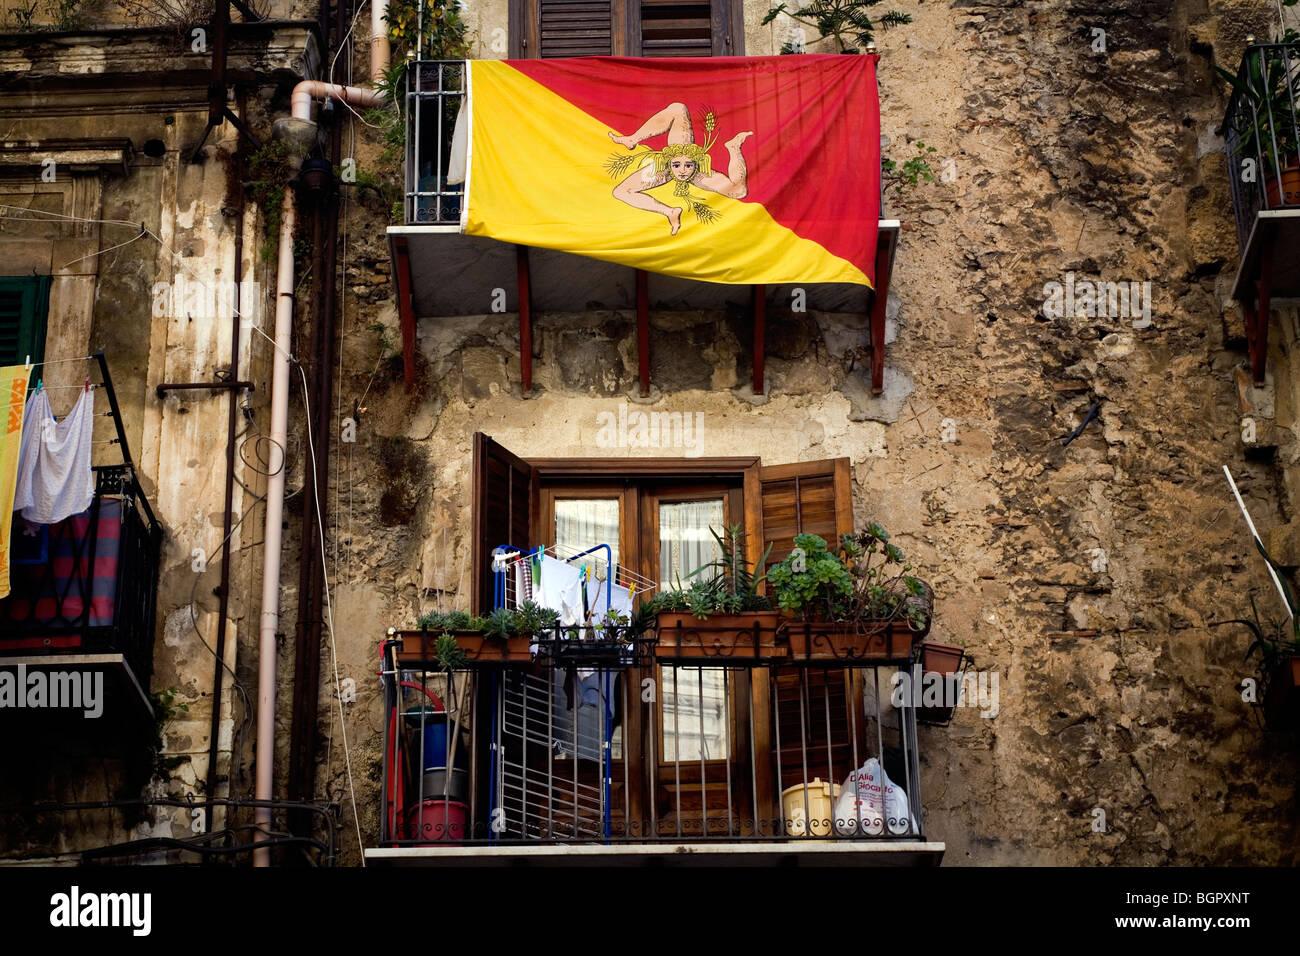 Sicilian flag on a balcony Palermo, Sicily, Italy. - Stock Image